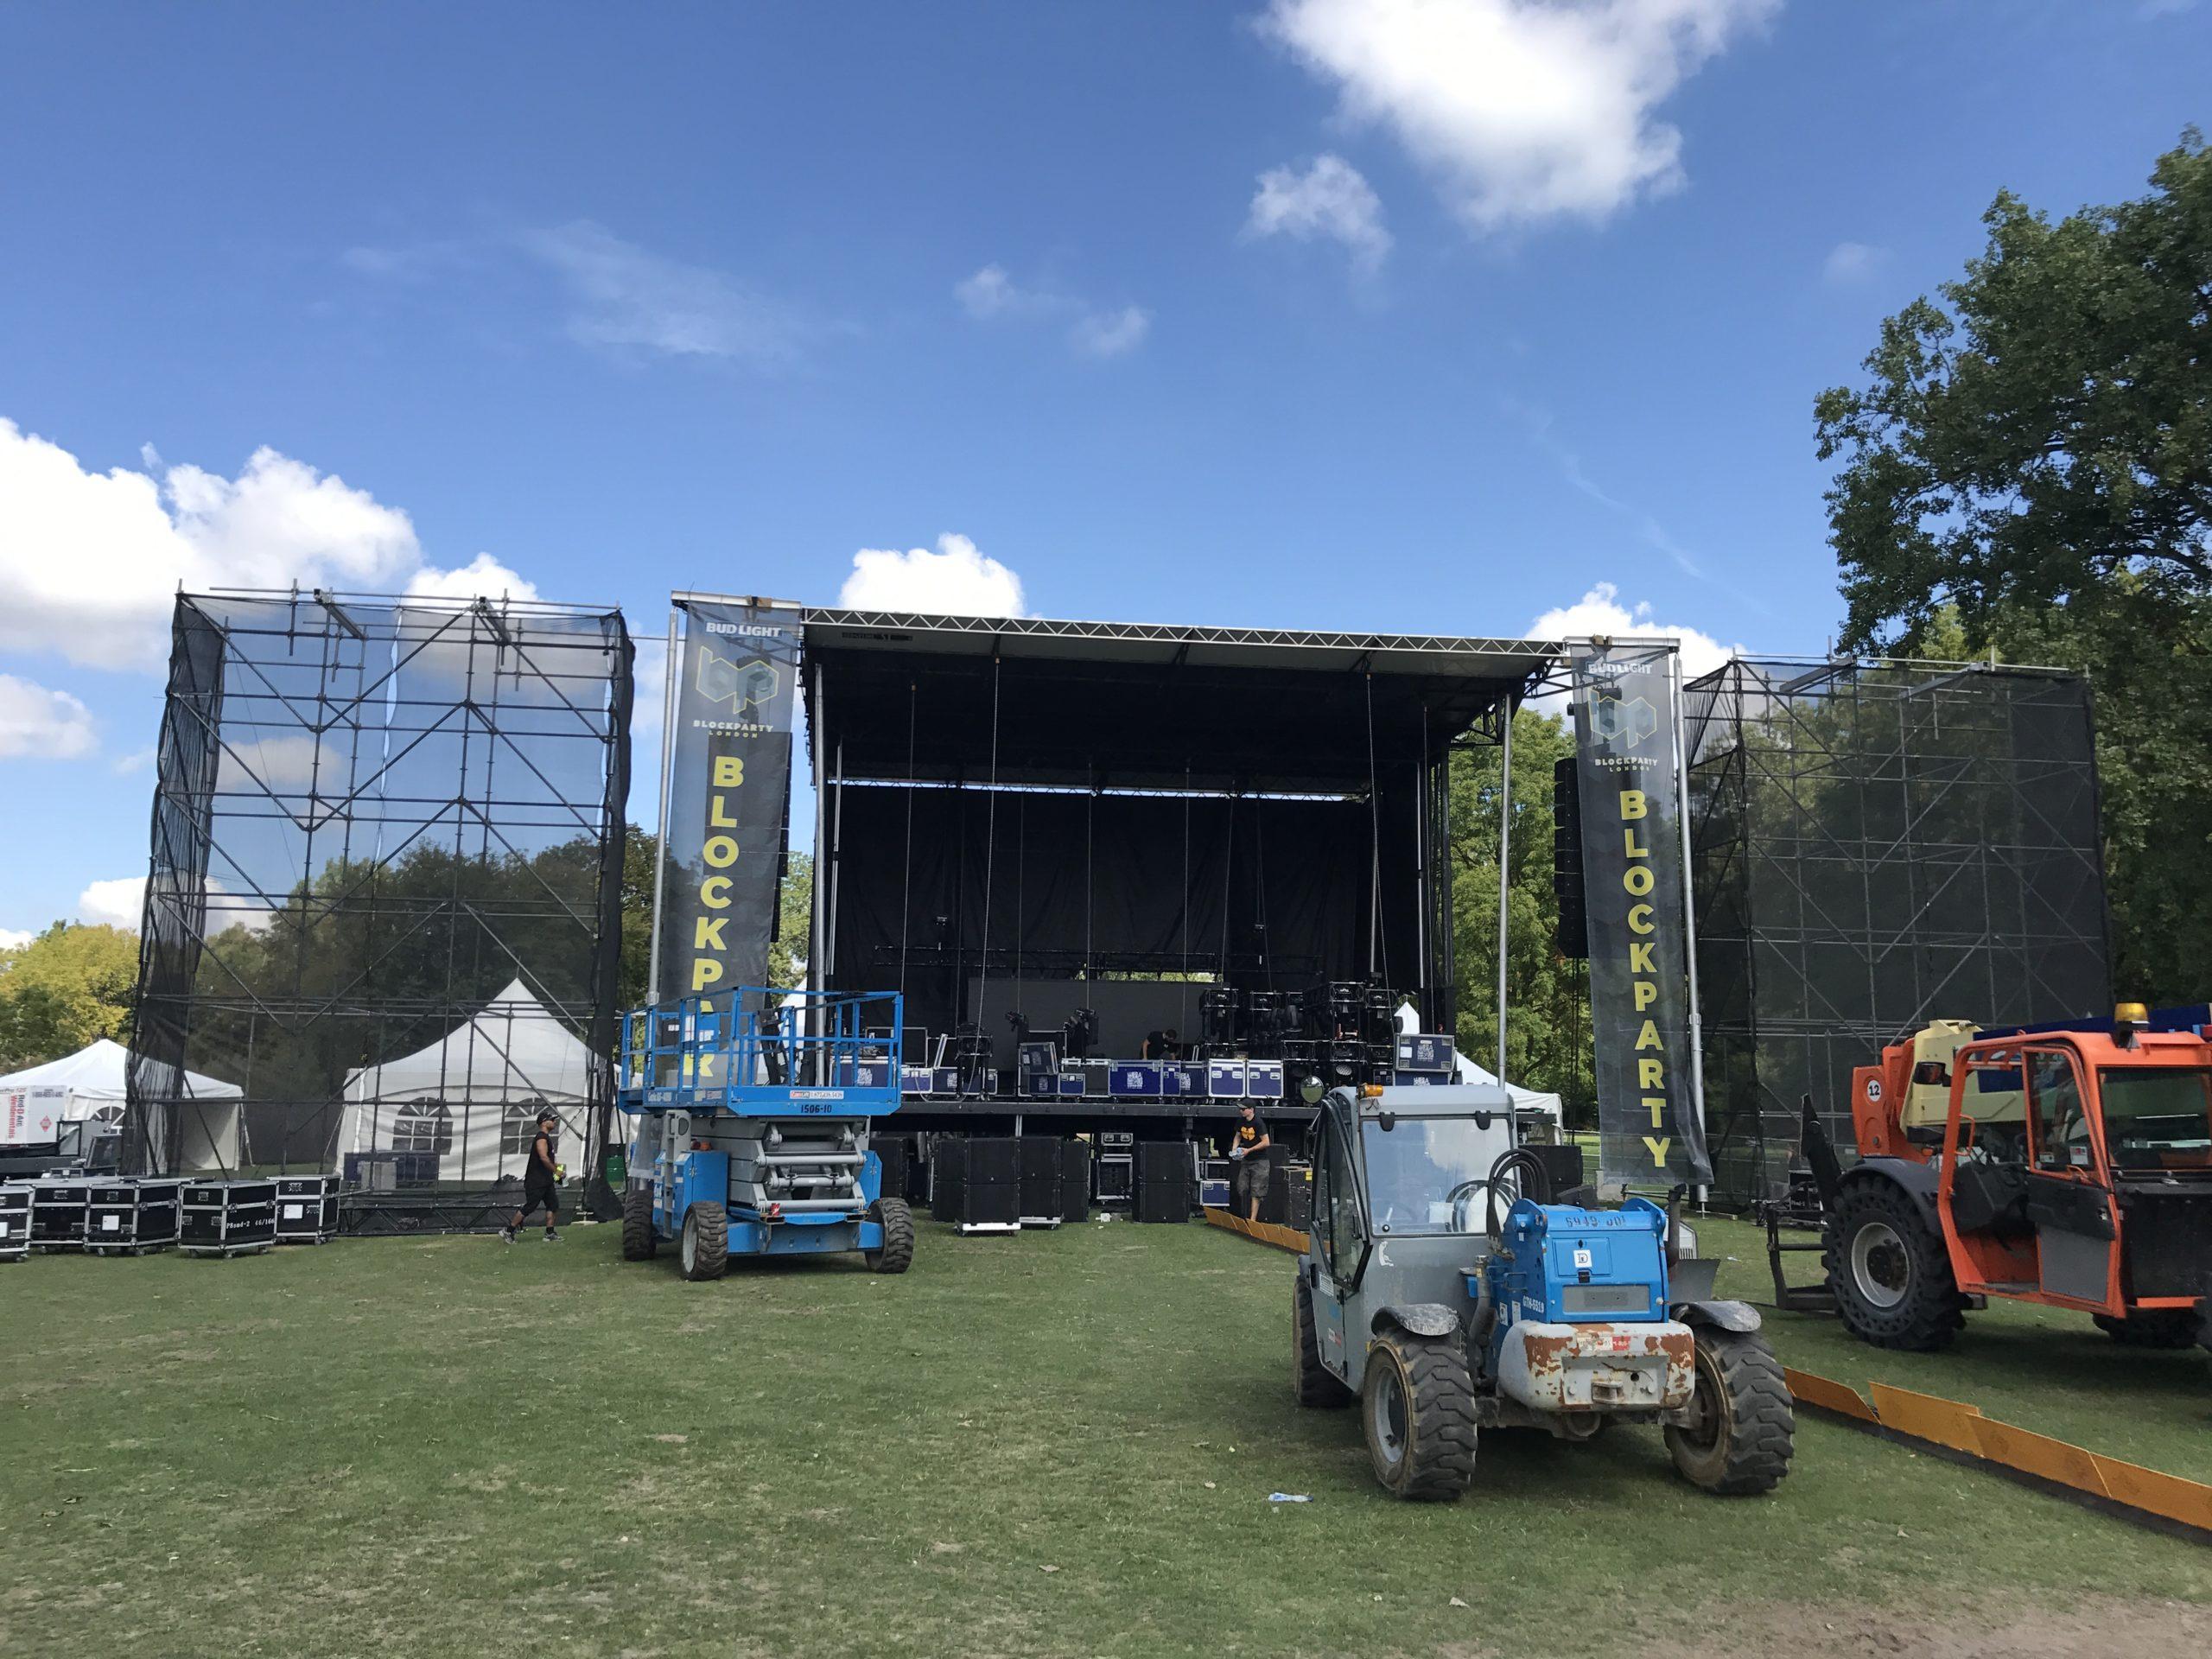 Harris Park prepares for London's biggest EDM Festival